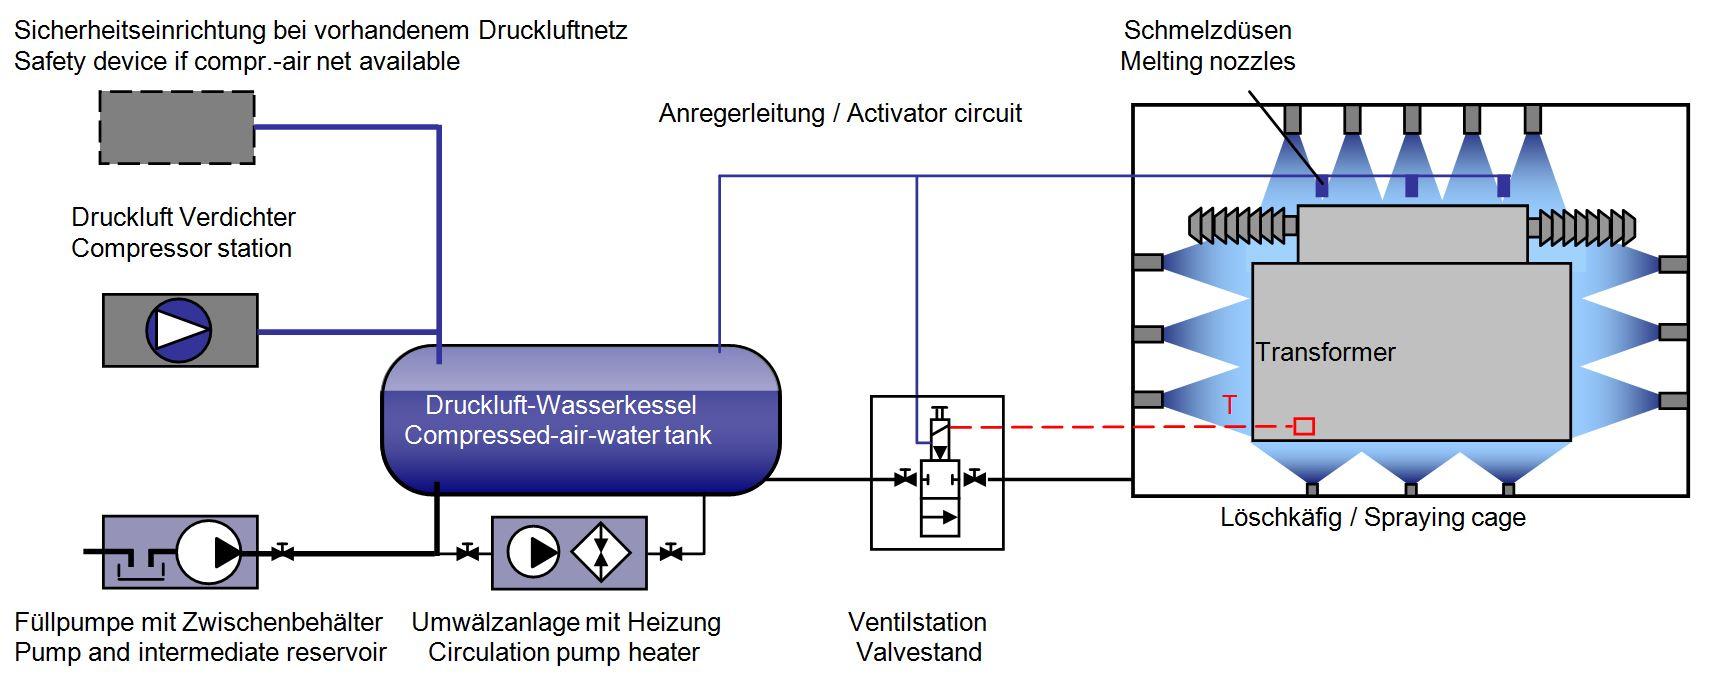 Firefighting Systems Transformers - HL Hydraulik GmbH Herdorf ...